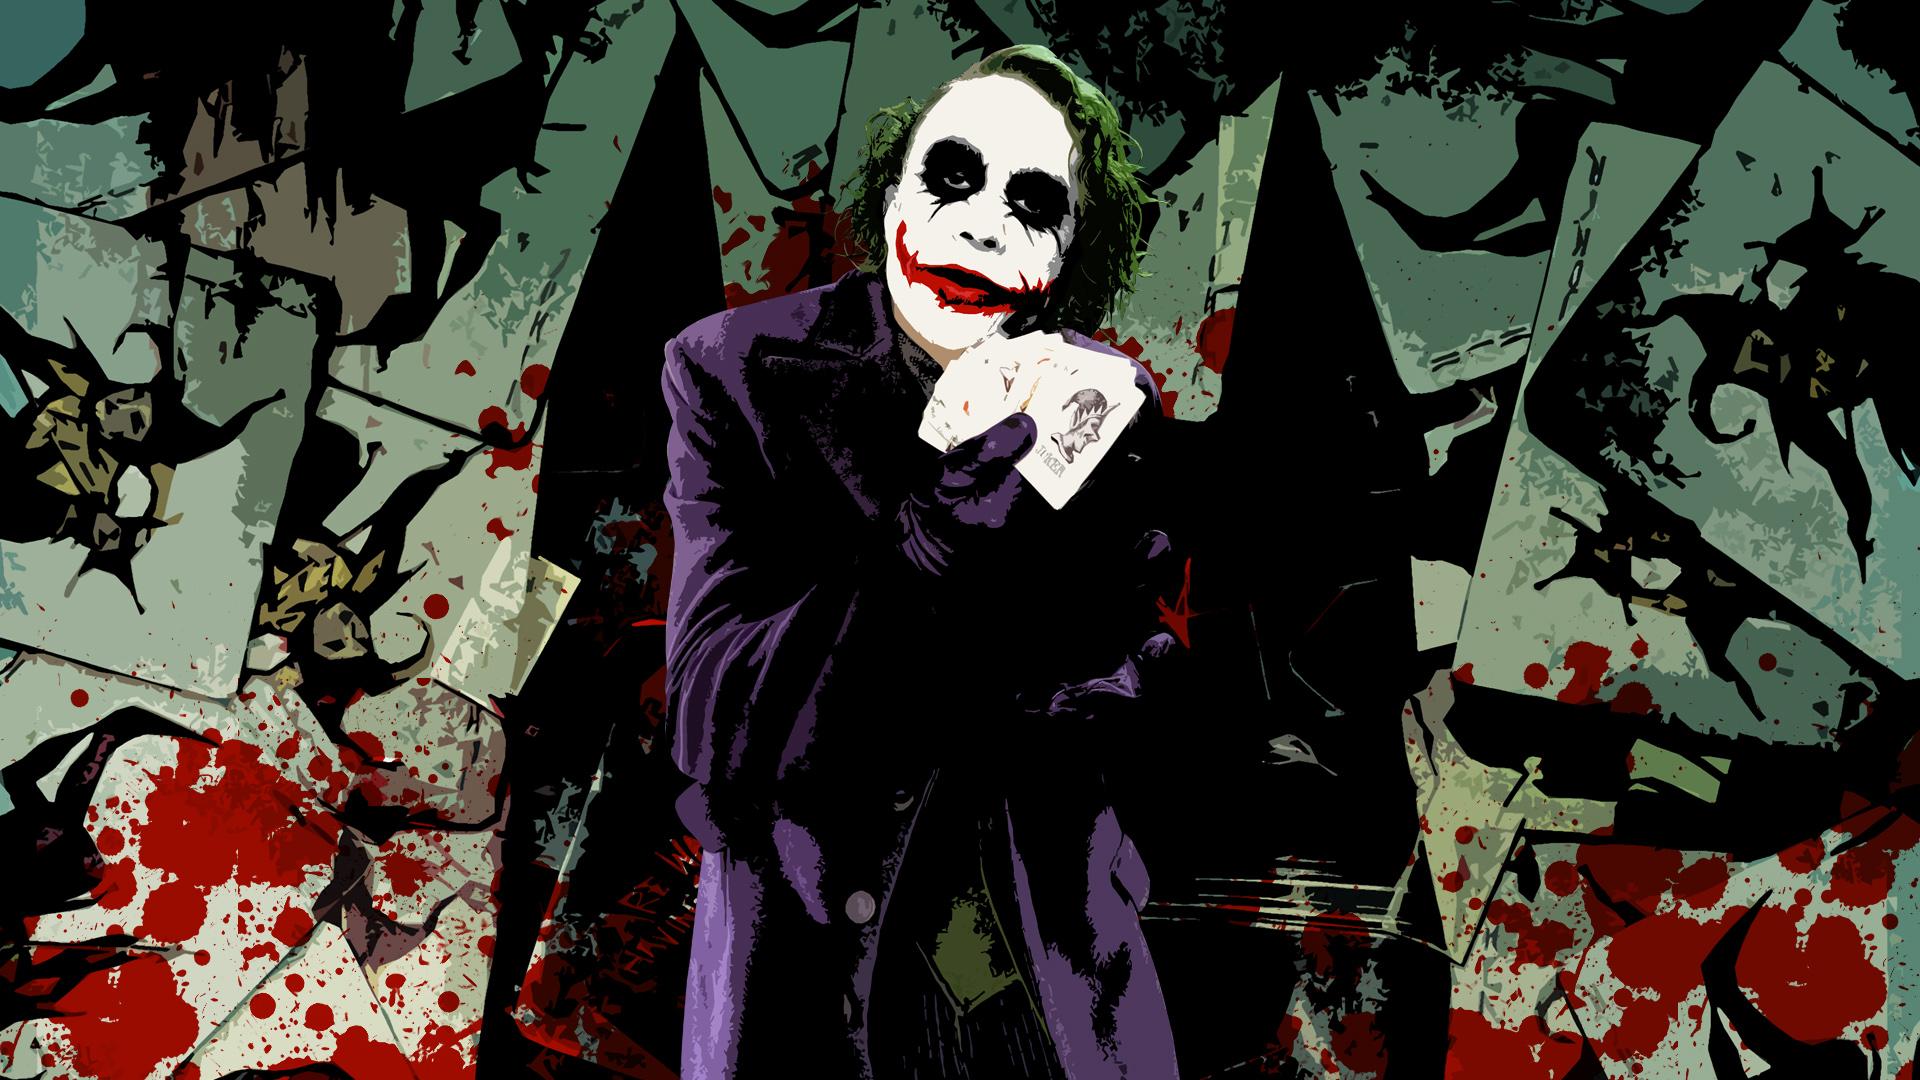 Joker Wallpaper Hd 207400 1920x1080